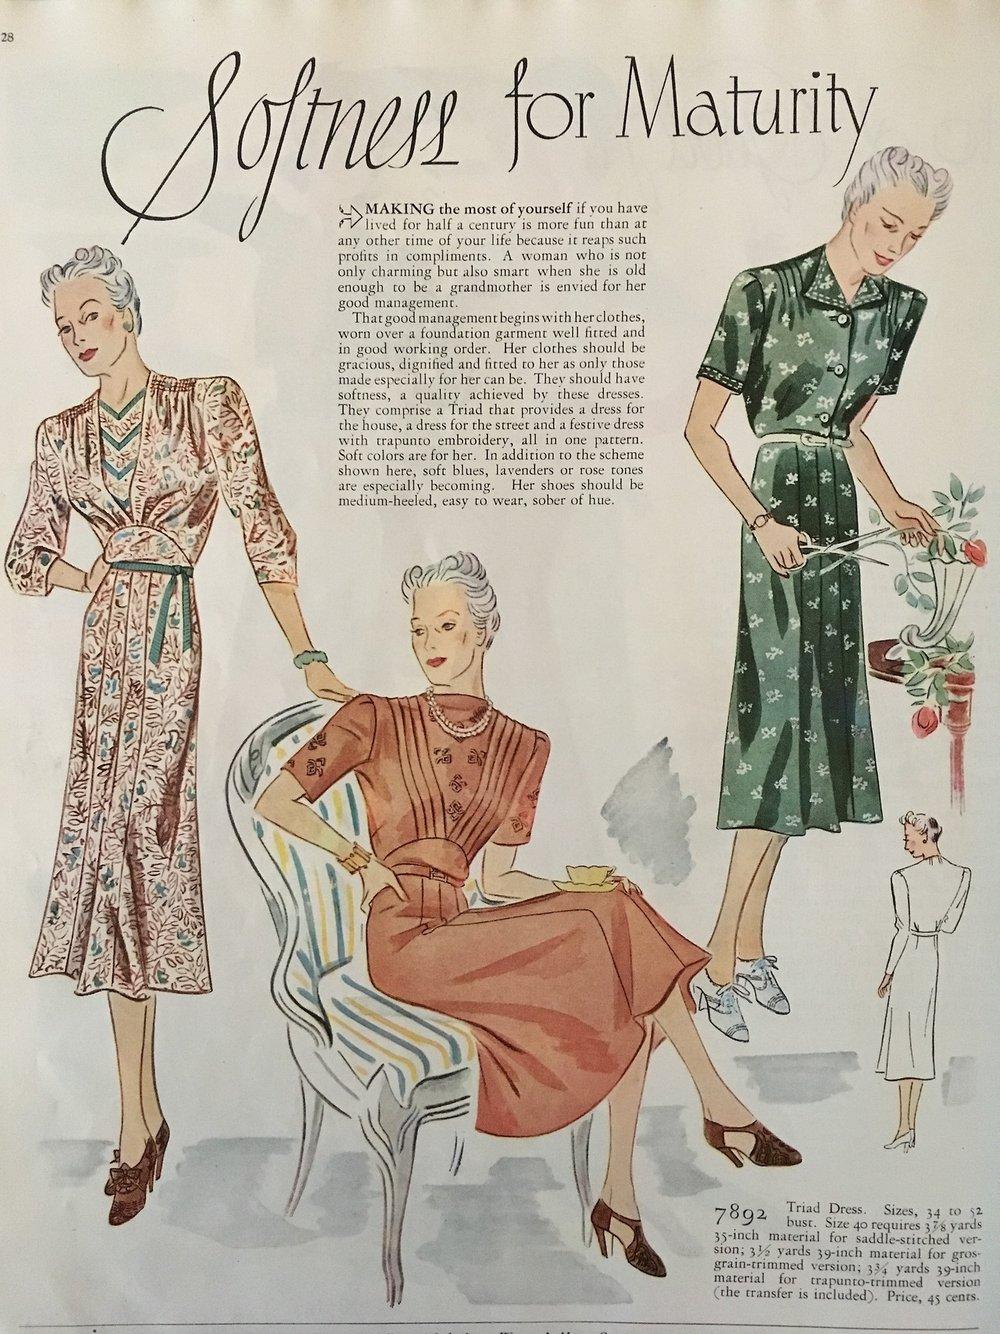 Softness for Maturity. Woman's Home Companion. May 1938.